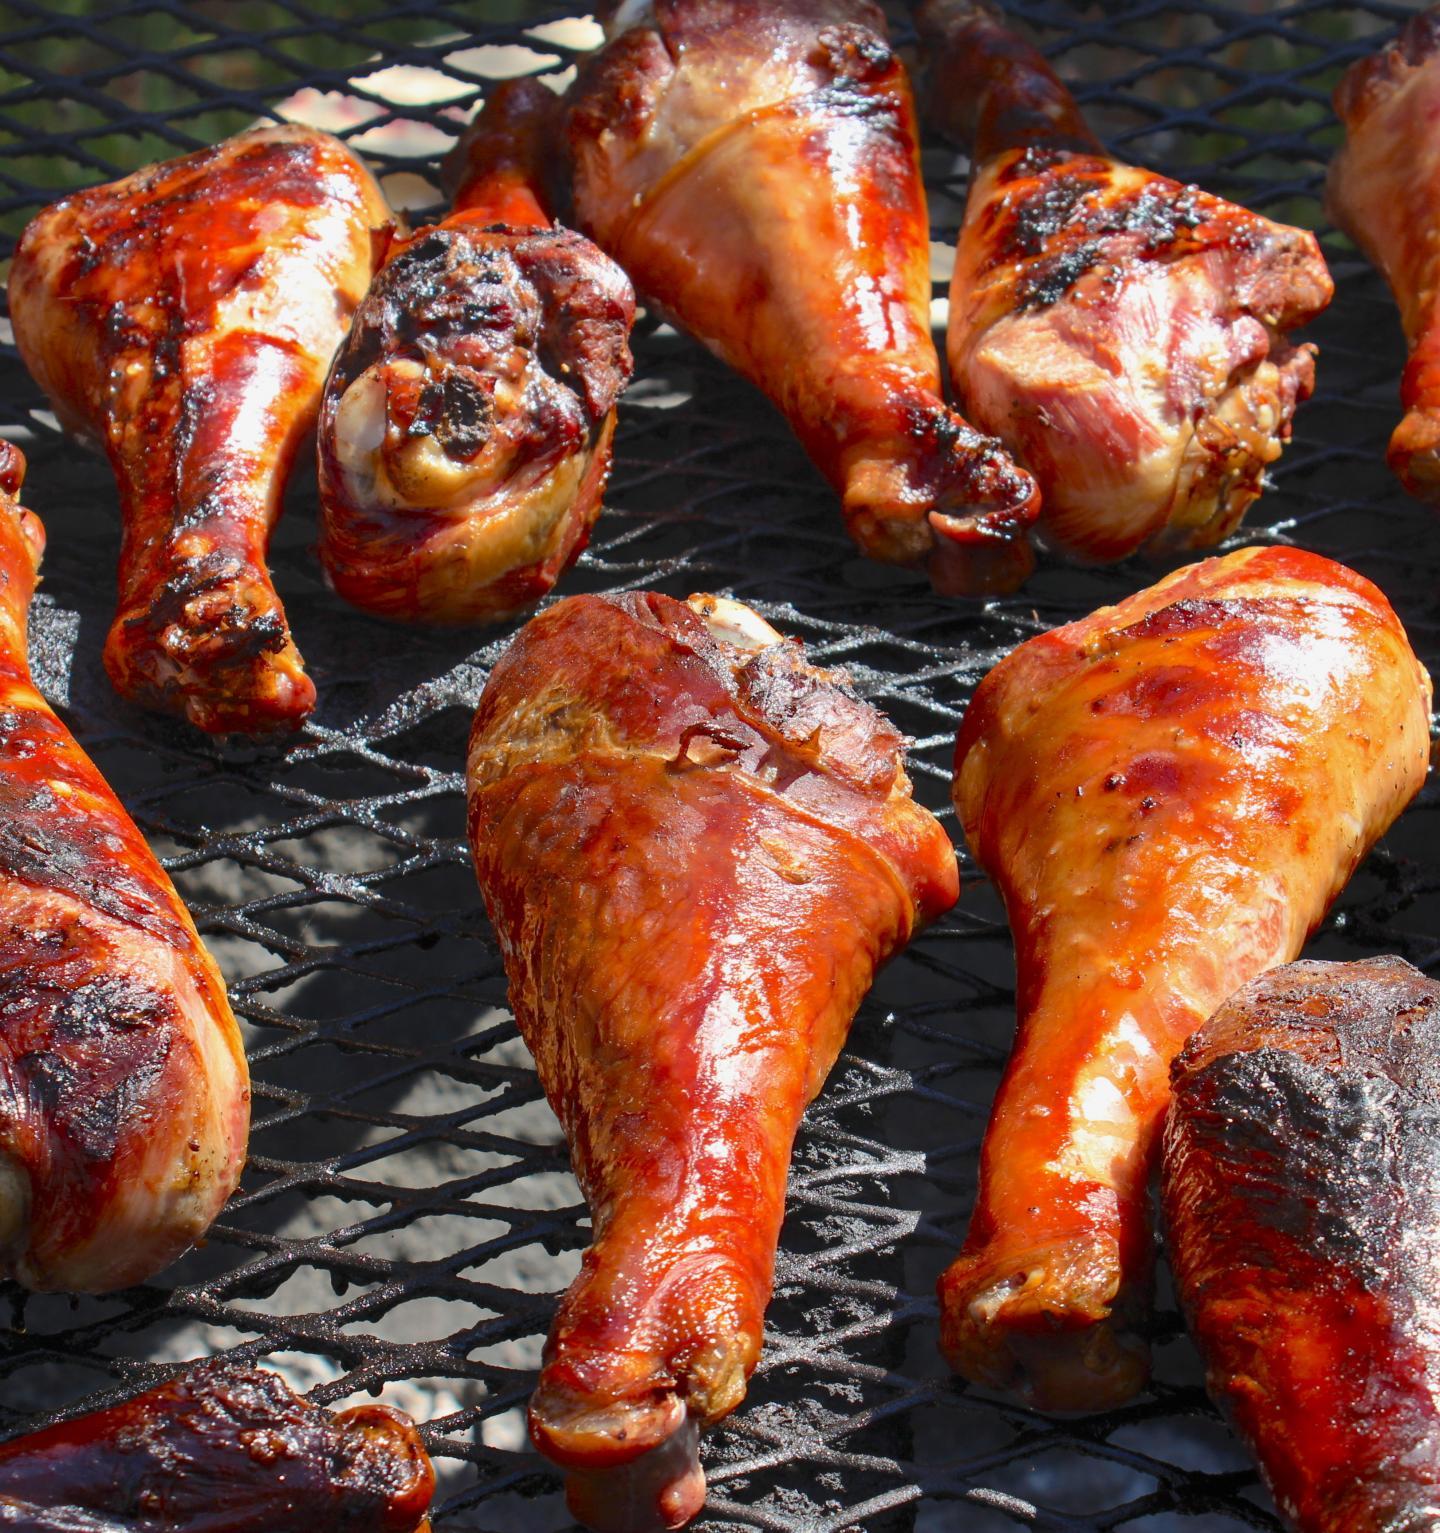 Turkey legs on grill